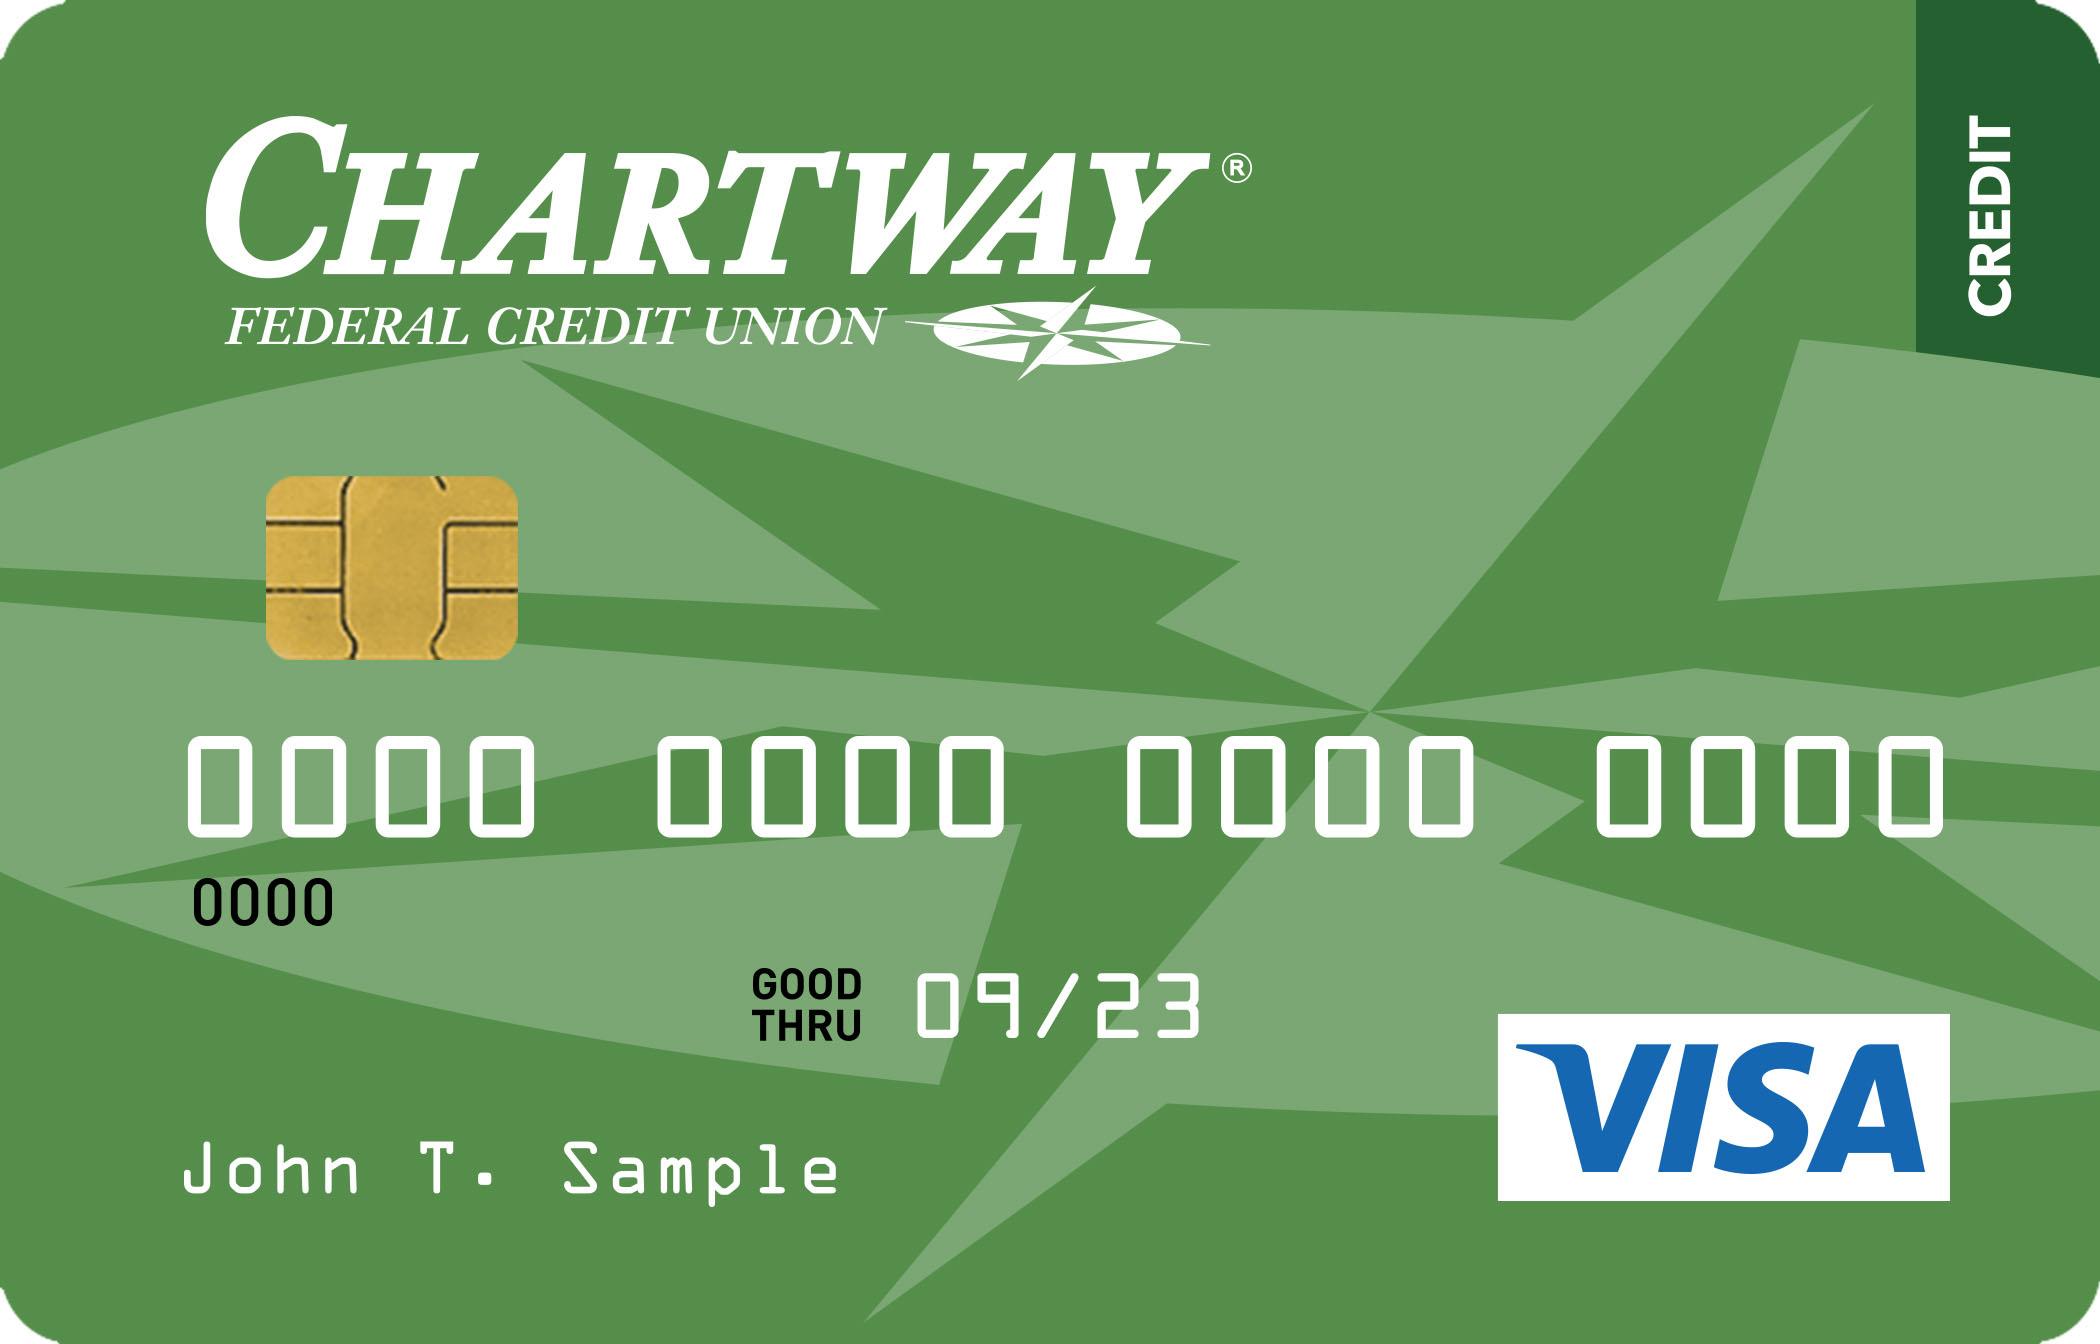 apply now visa signature rewards card - Visa Credit Card Application